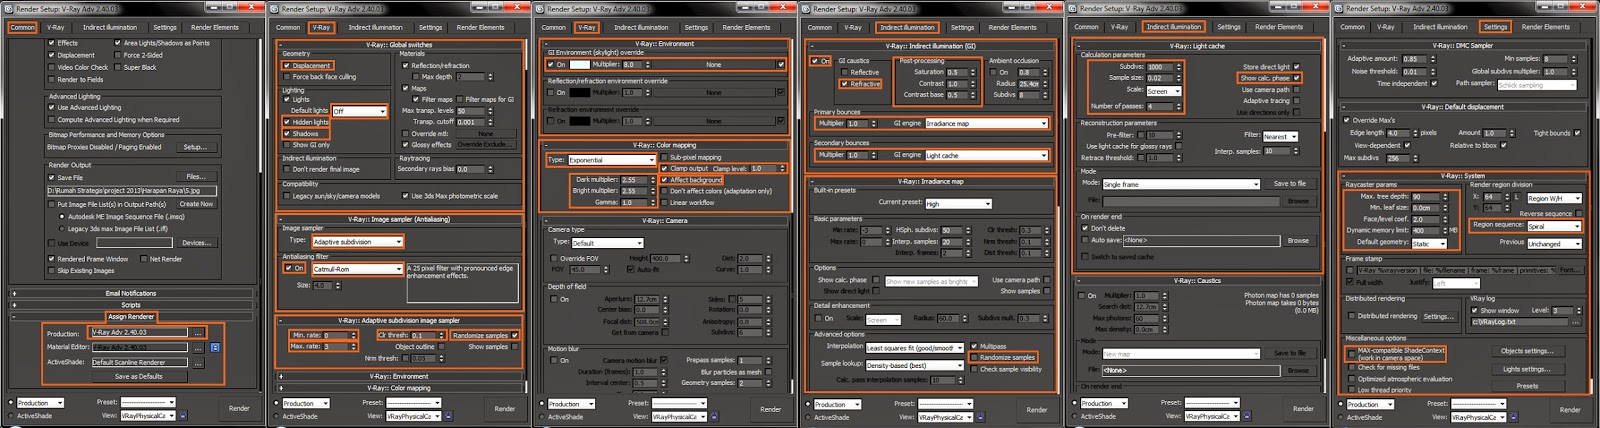 Design of drafter settingan render vray 3ds max 2012 Vray render preset exterior download